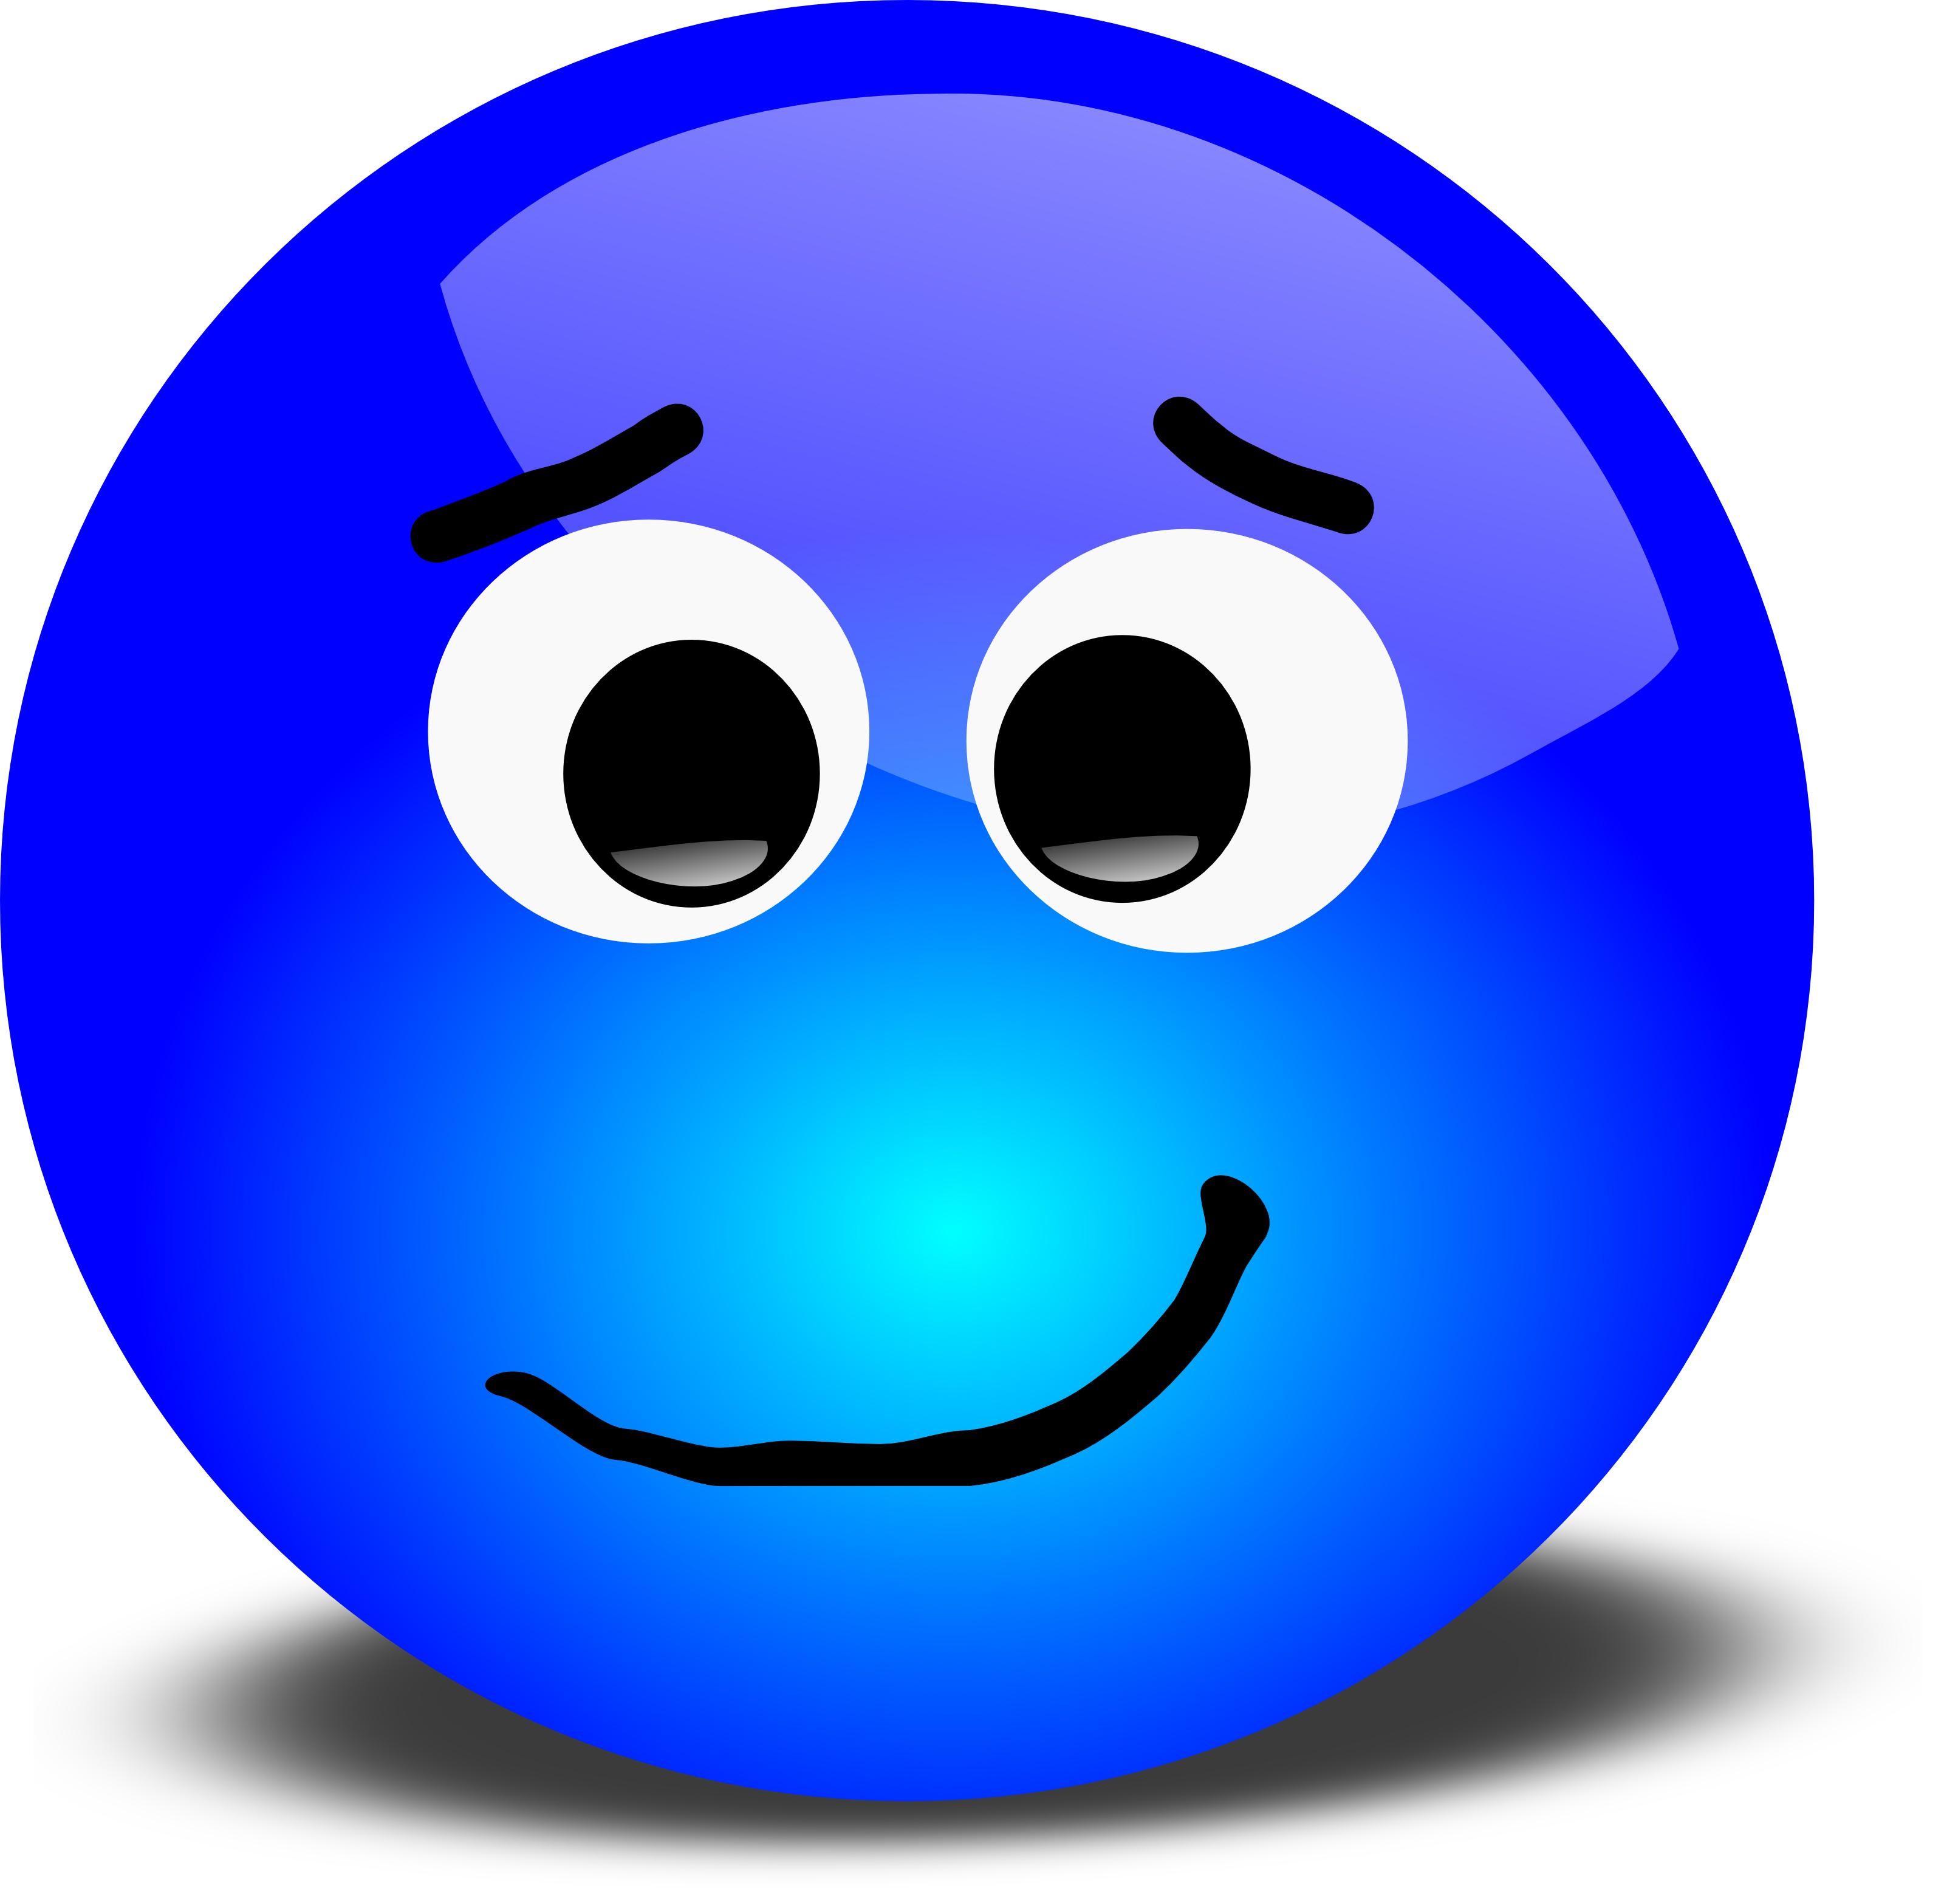 Dislike face clipart clip art freeuse download Smiley Face Clip Art Emotions | Clipart Panda - Free Clipart Images clip art freeuse download